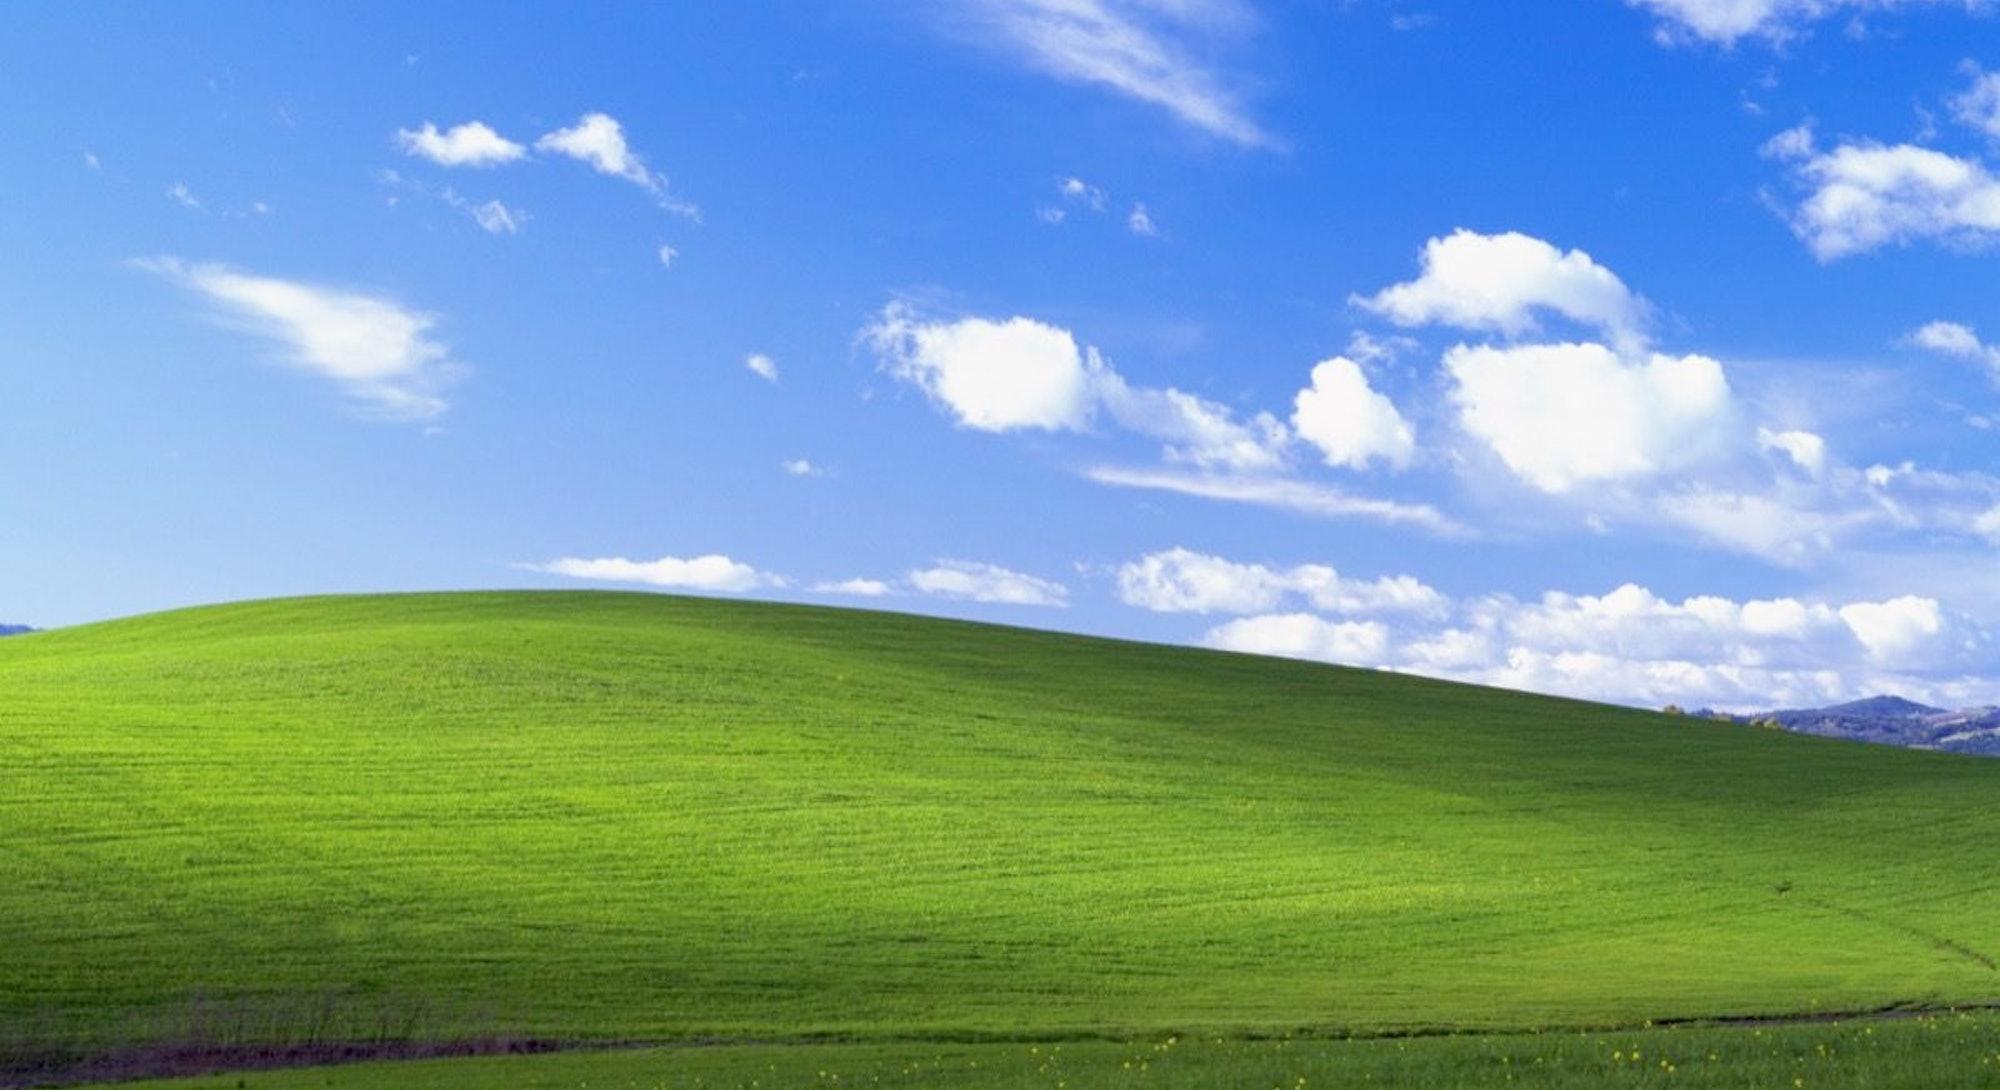 Microsoft's famous Windows XP background wallpaper.